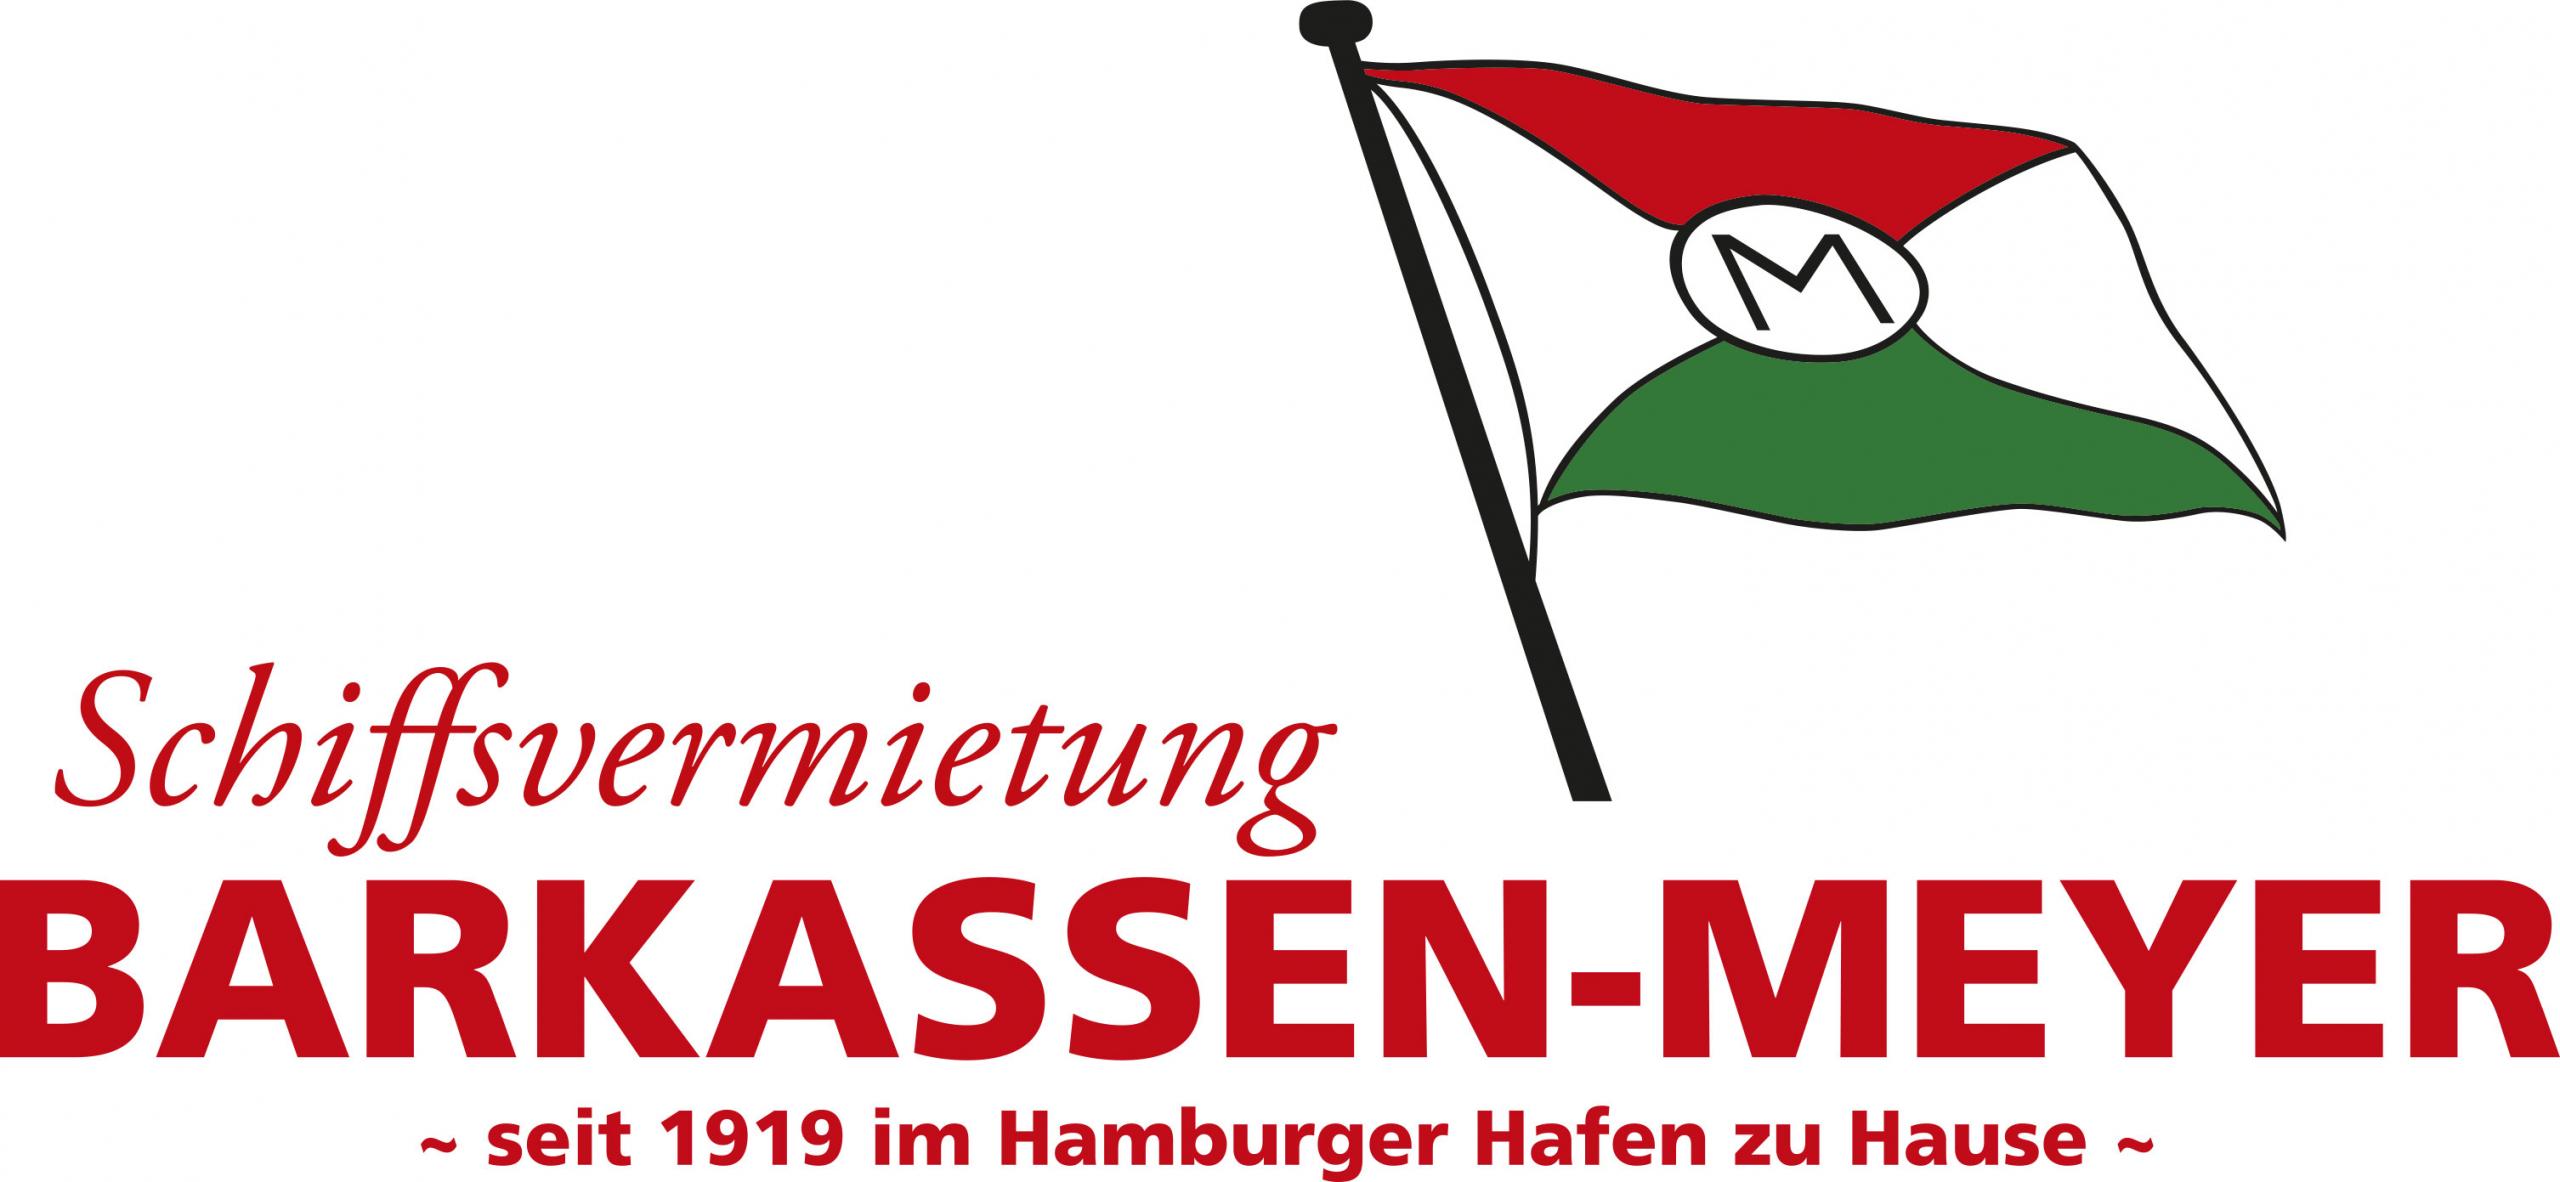 Barkassen-Meyer Logo